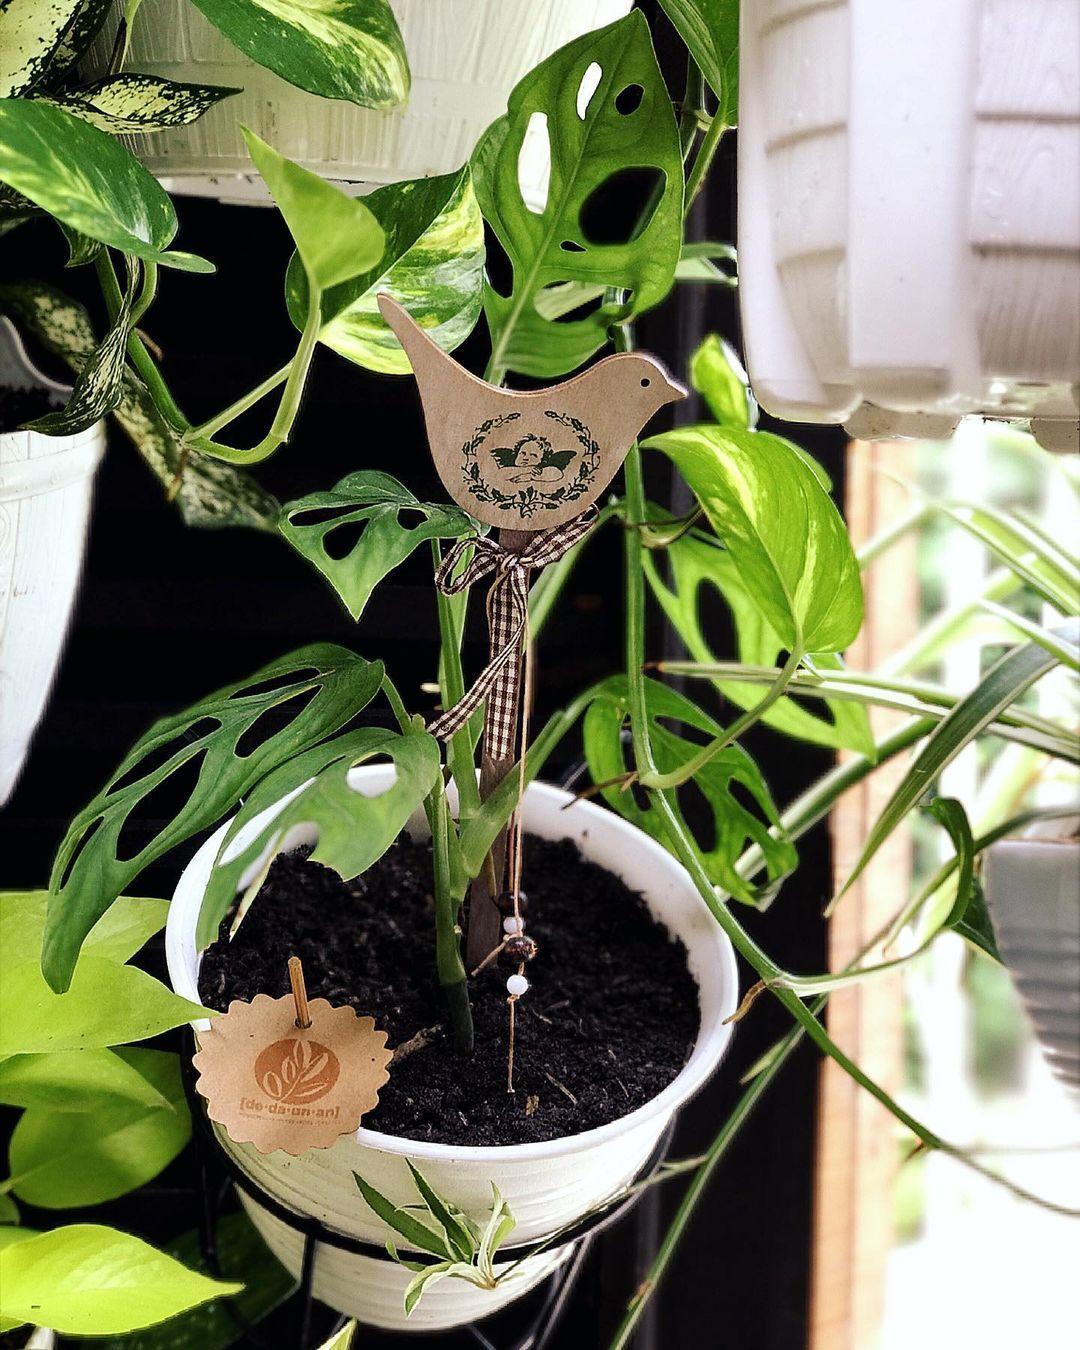 Dedaunan On Instagram Klo Monstera Adansonii Versi Pot Gantung Yg Ada Turus Gambar Burungnya Udah Ada Kah 125k Dedaunanshopme Dedaunanshopme Plants